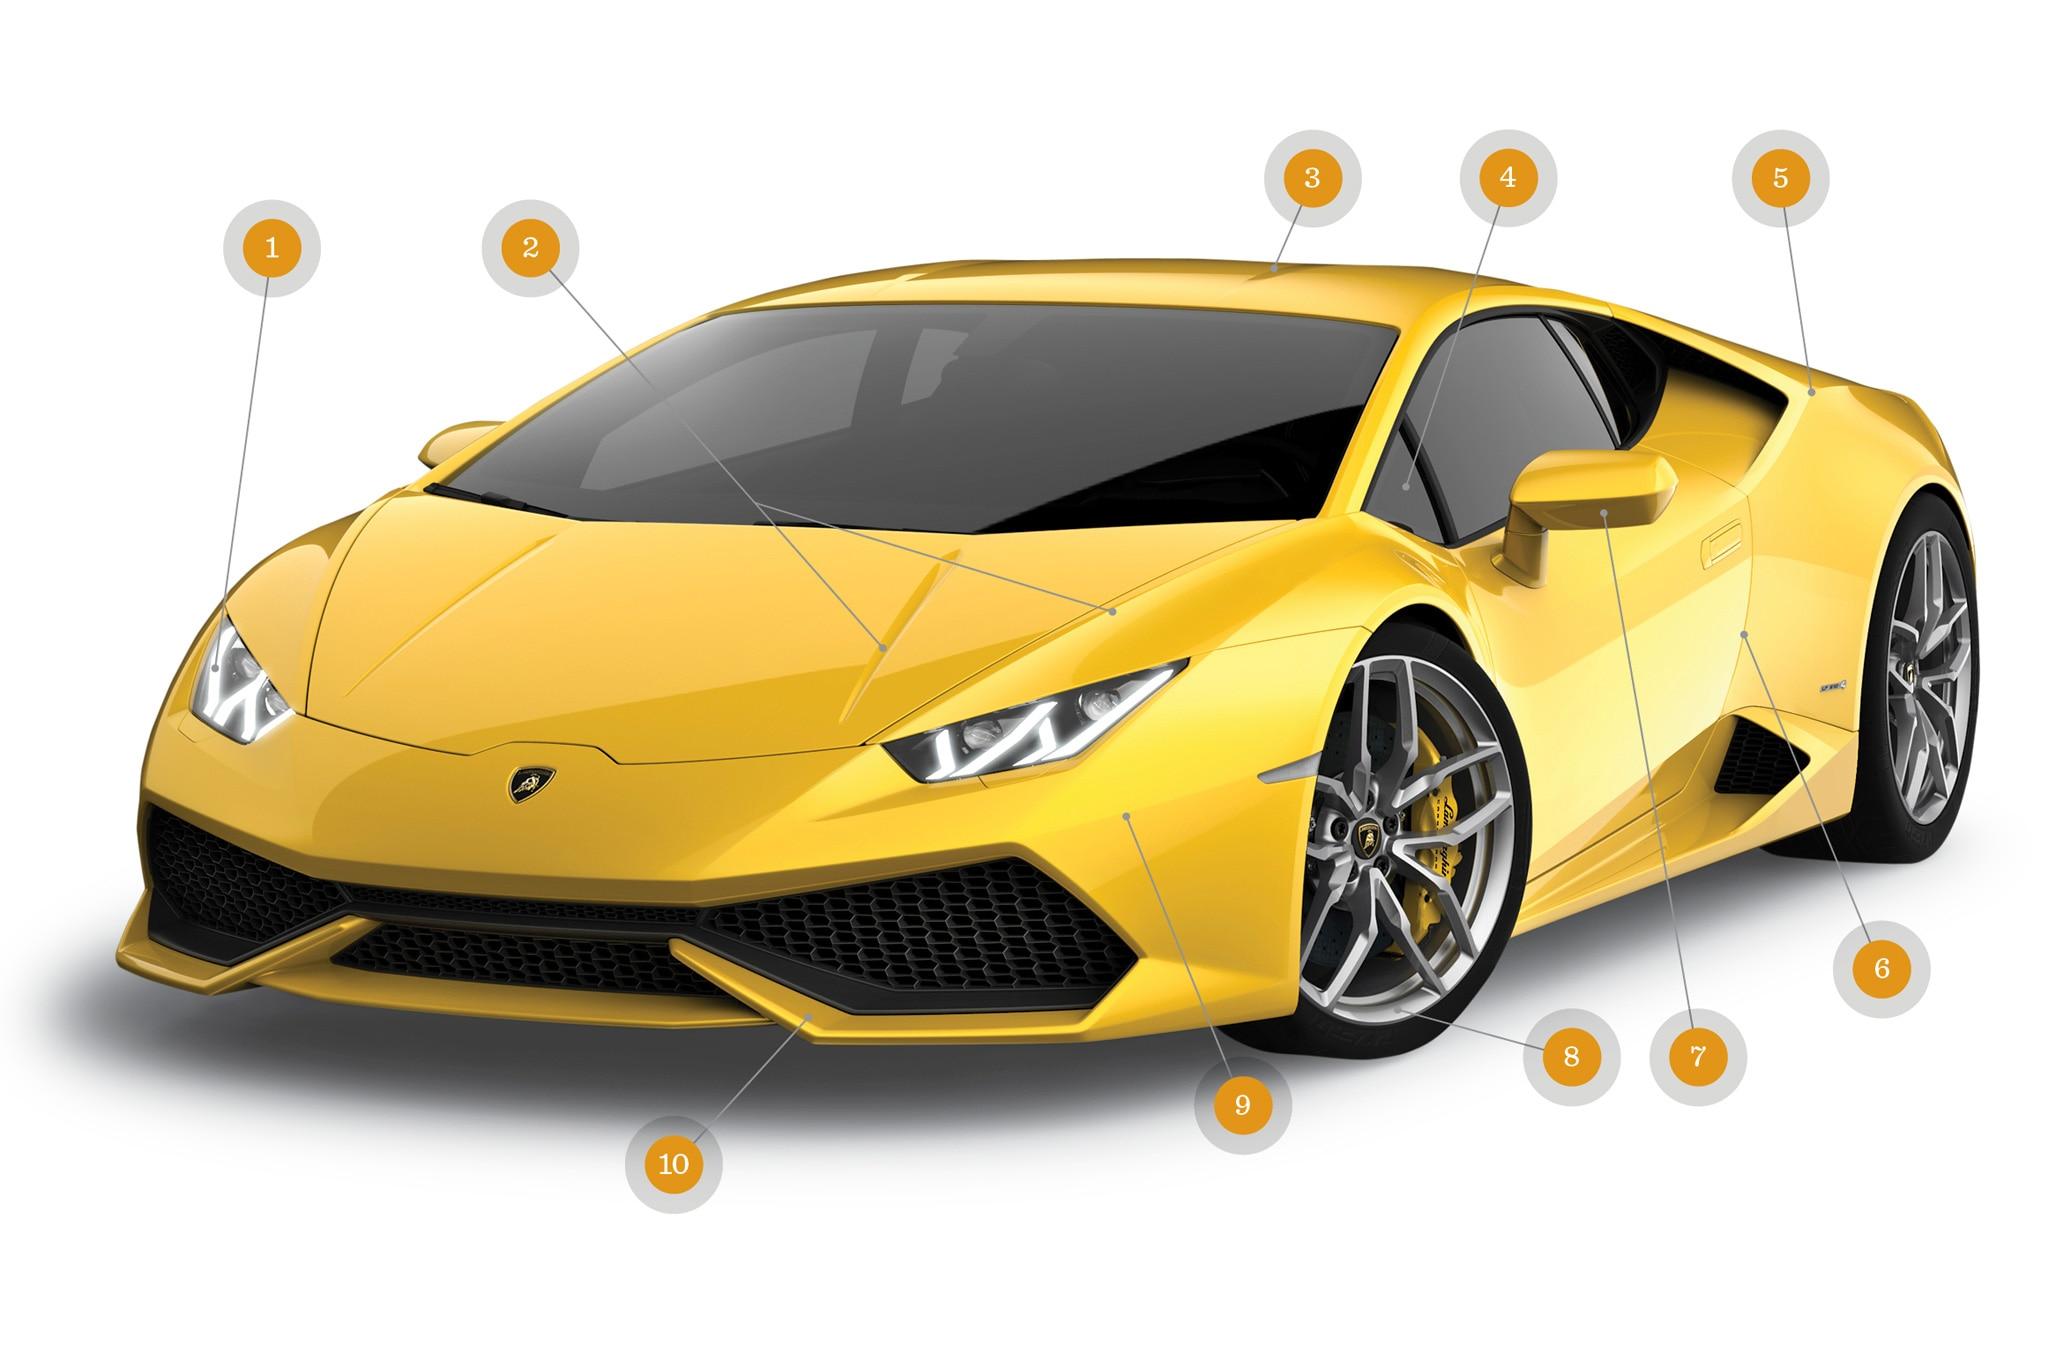 2015-lamborghini-huracan-by-design-front-three-quarter Amazing 2015 Lamborghini Huracan Price Per Month Cars Trend